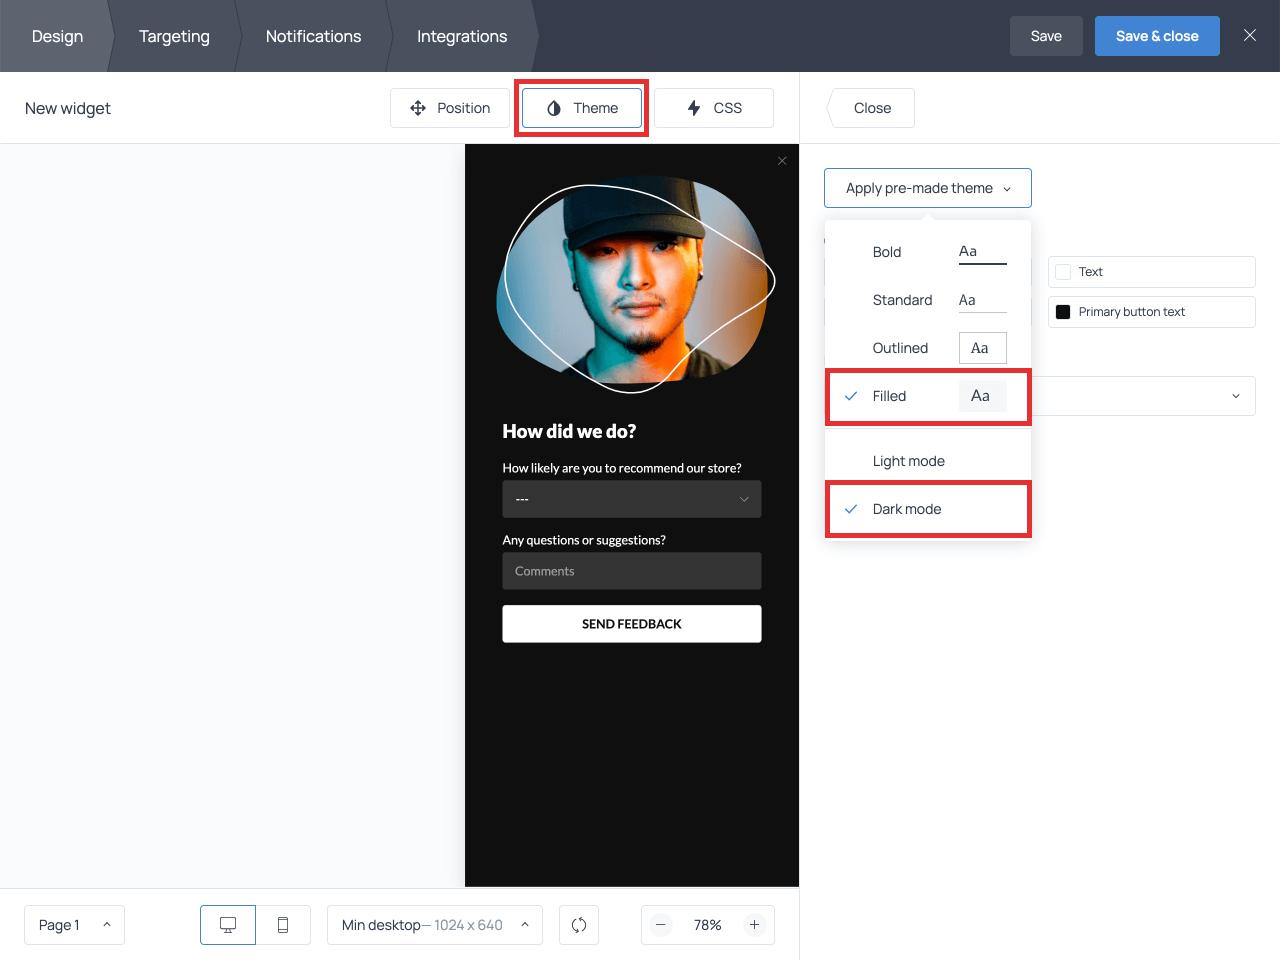 Getsitecontrol survey targeting settings